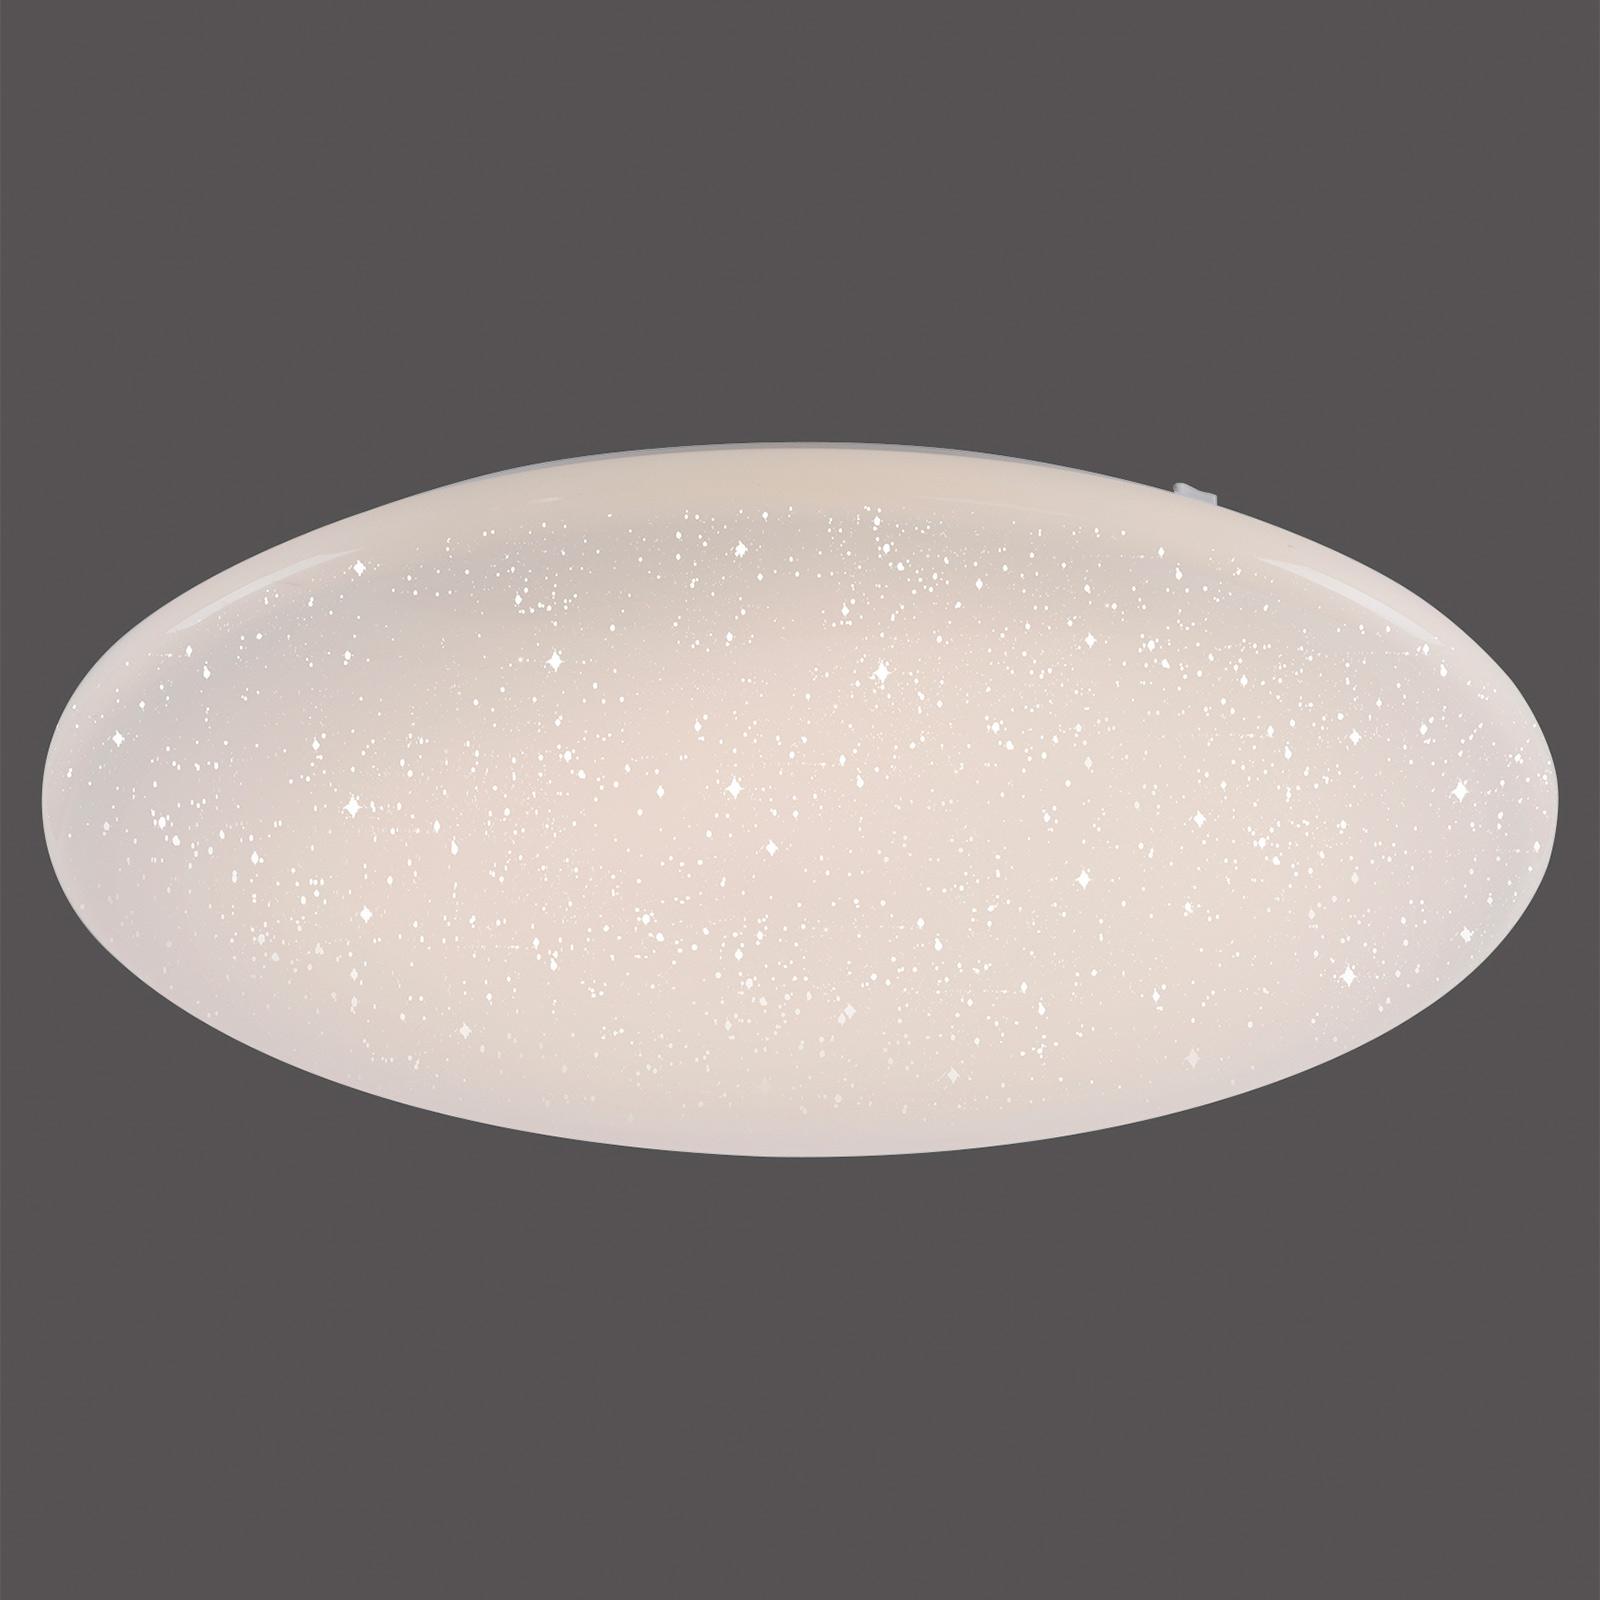 LED-Deckenleuchte LOLAsmart Uranus Ø 70 cm